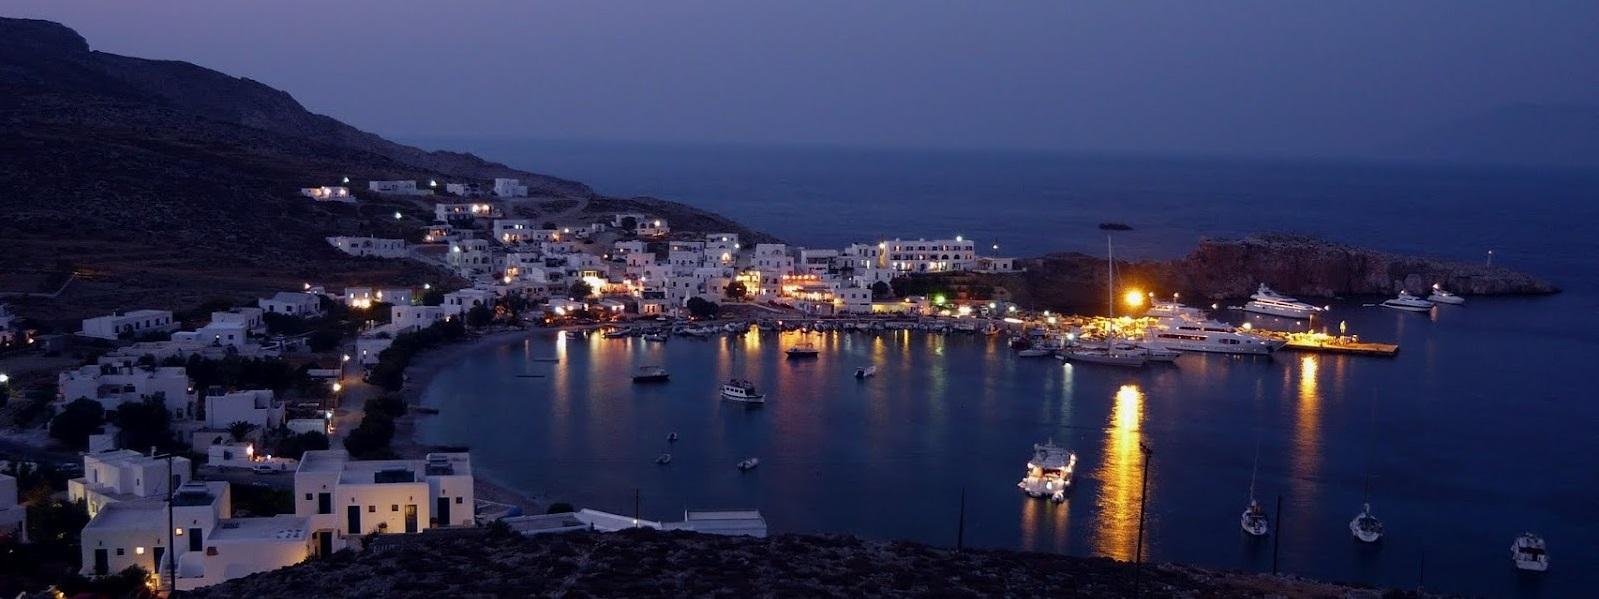 The port of Folegandros - Sail in Greek Waters